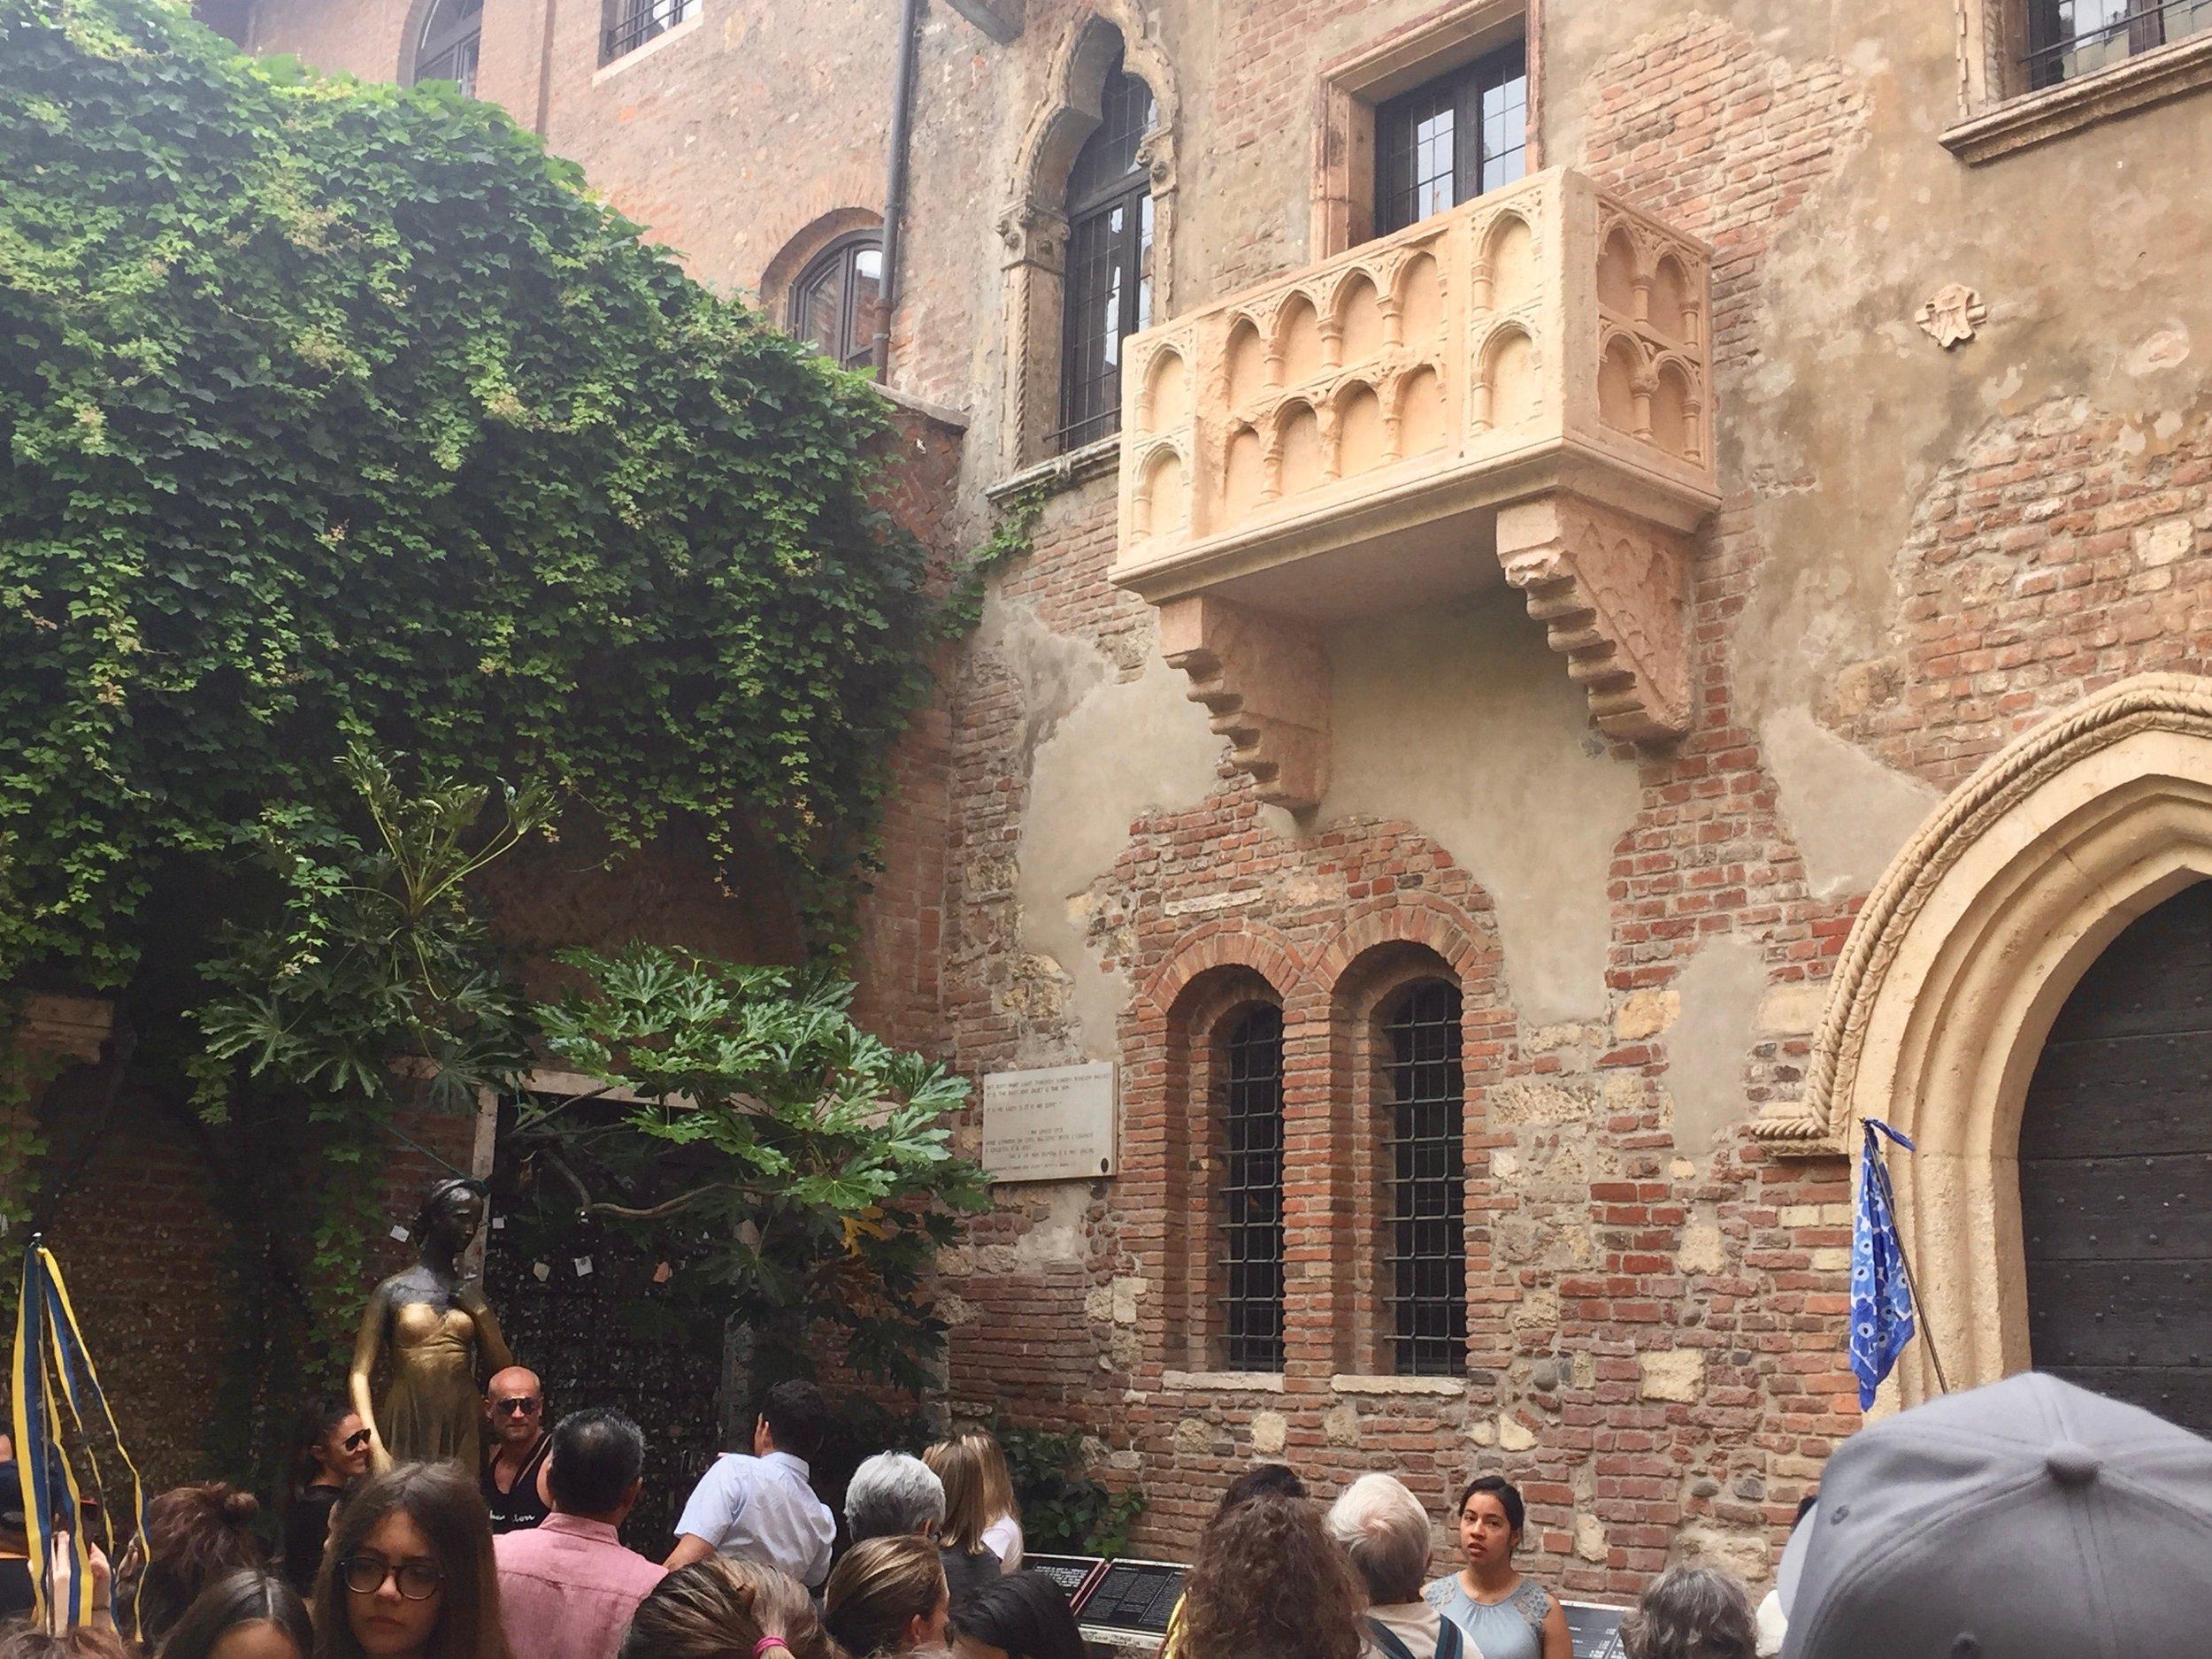 Juliet's balcony in Verona is a tucked away romantic location